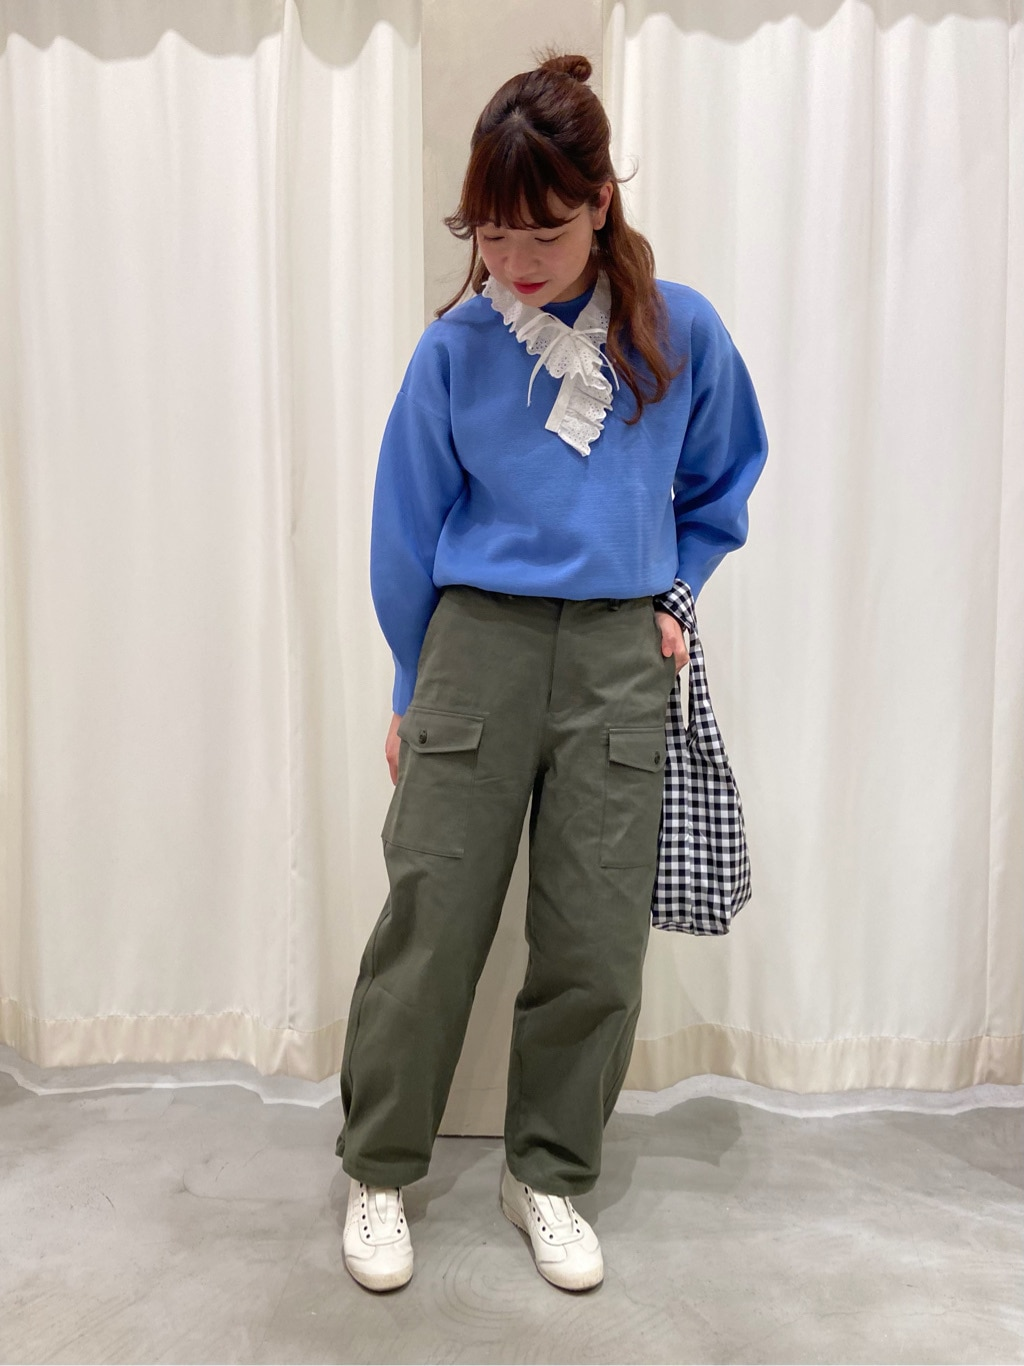 CHILD WOMAN , PAR ICI 東京スカイツリータウン・ソラマチ 2021.02.17